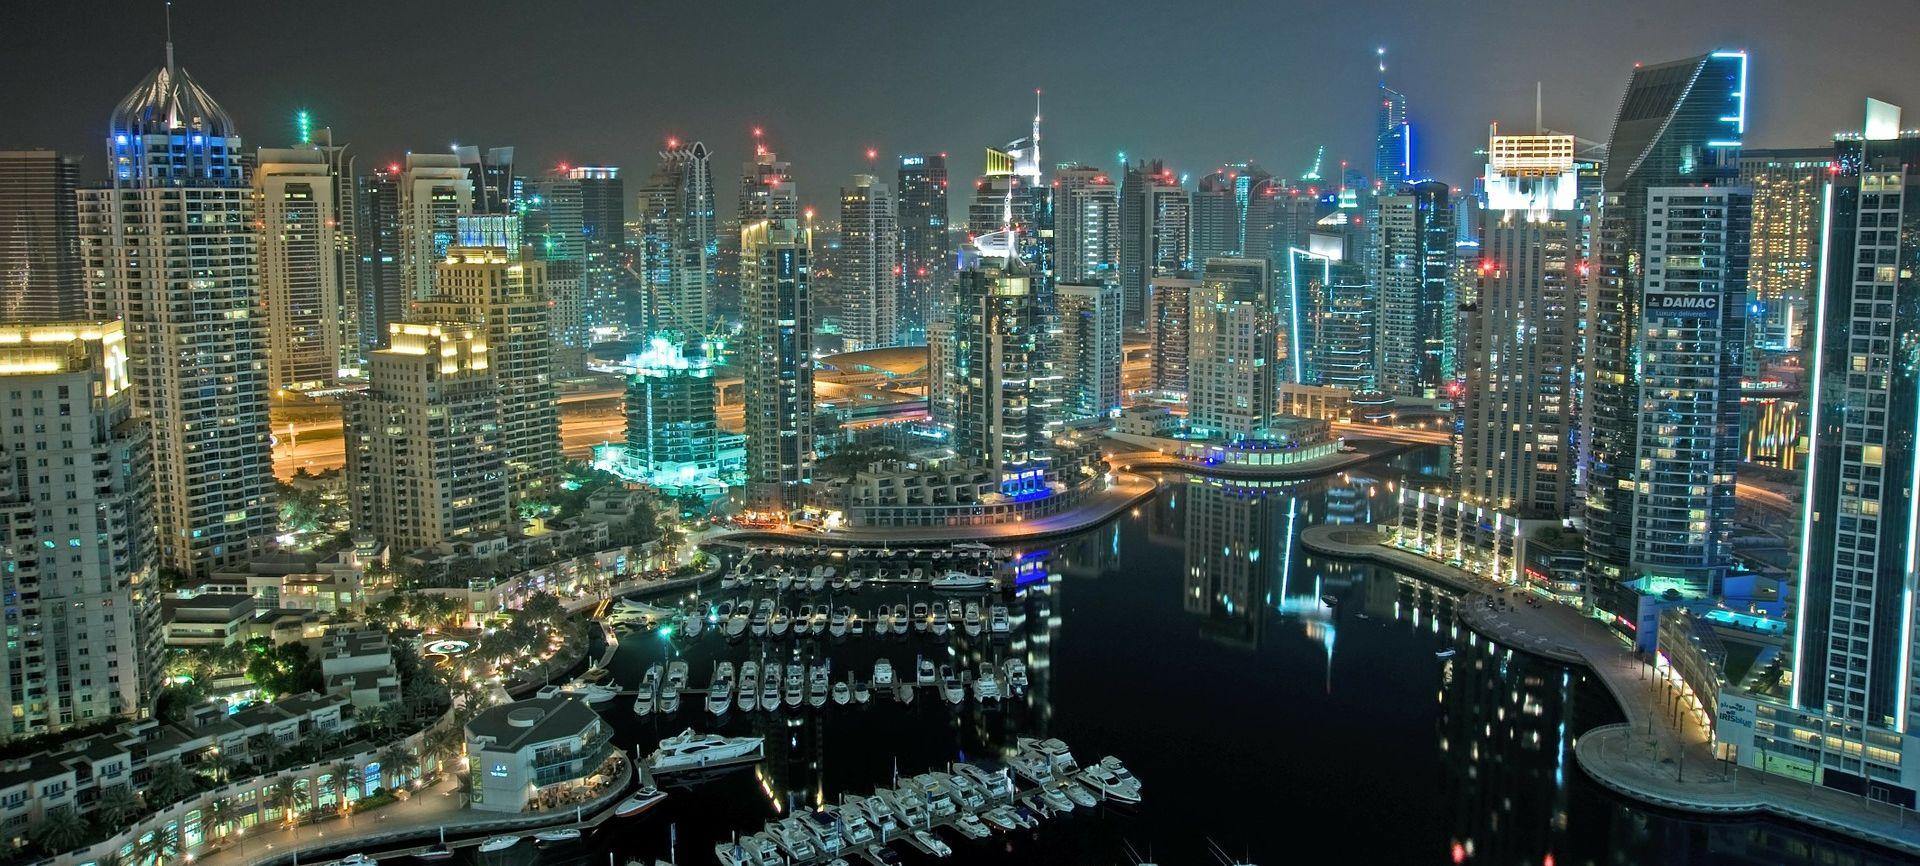 FOTO/VIDEO: VELIKI POŽAR U DUBAIJU Buknuo luksuzni hotel Address Downtown